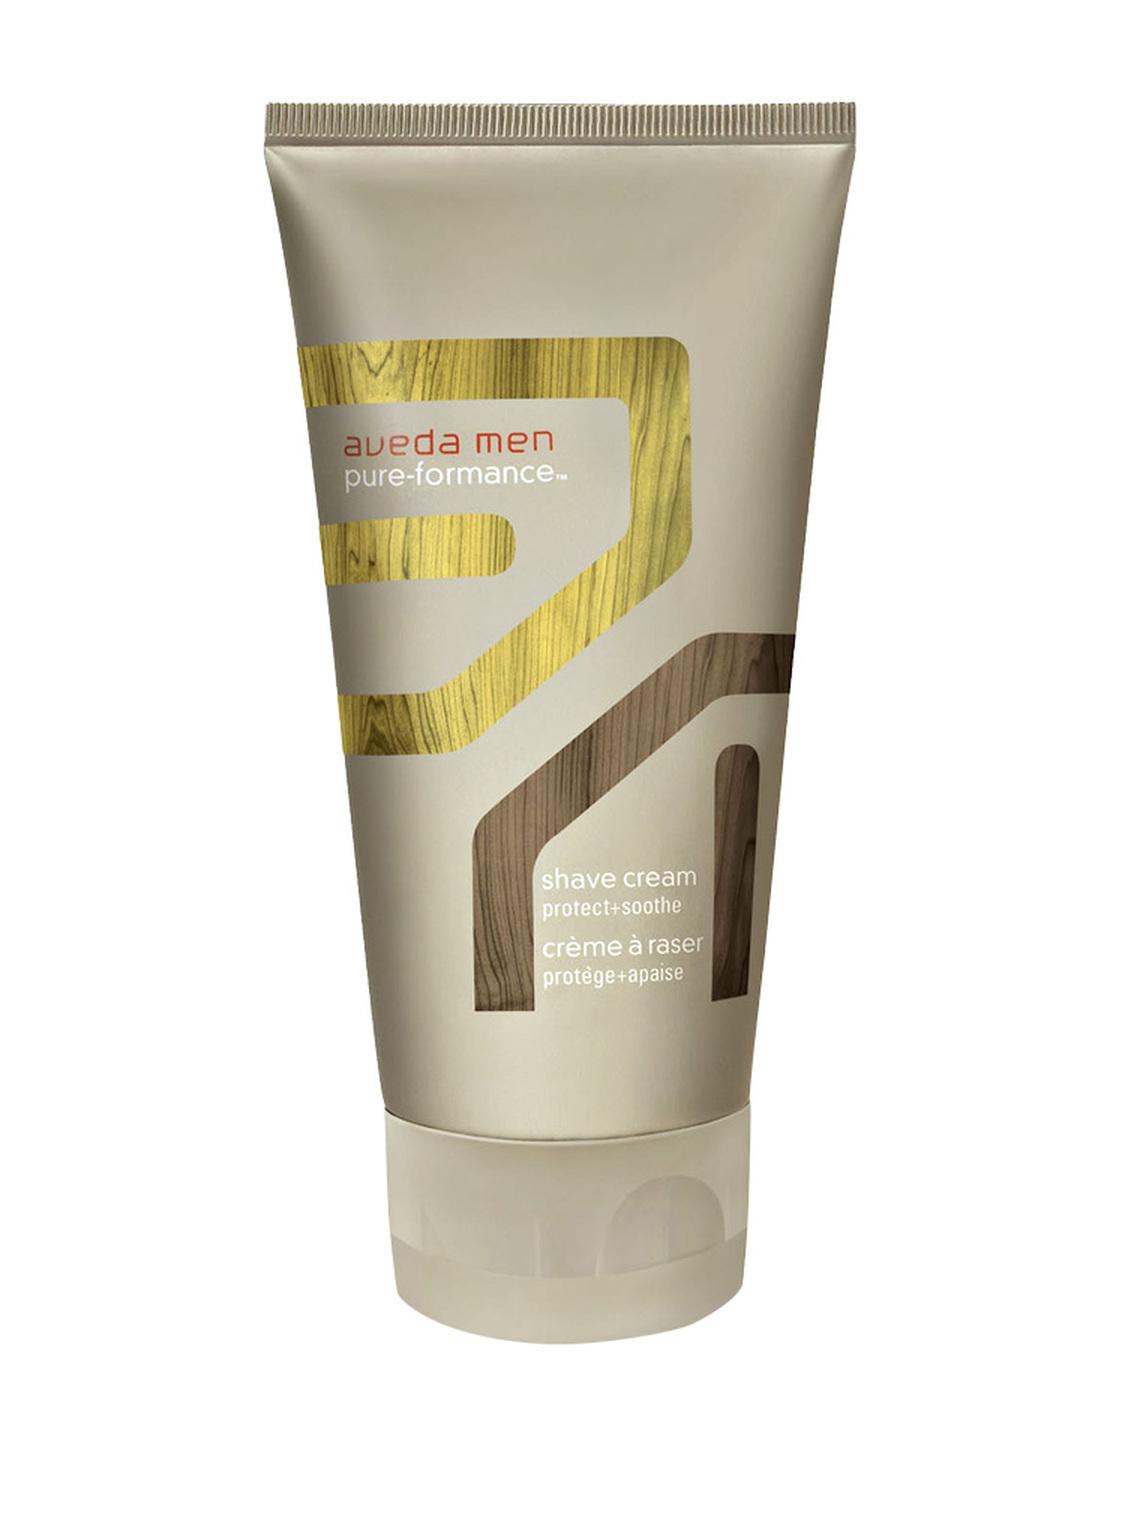 Image of Aveda Aveda Men Pure-Formance Shave Cream 40 ml